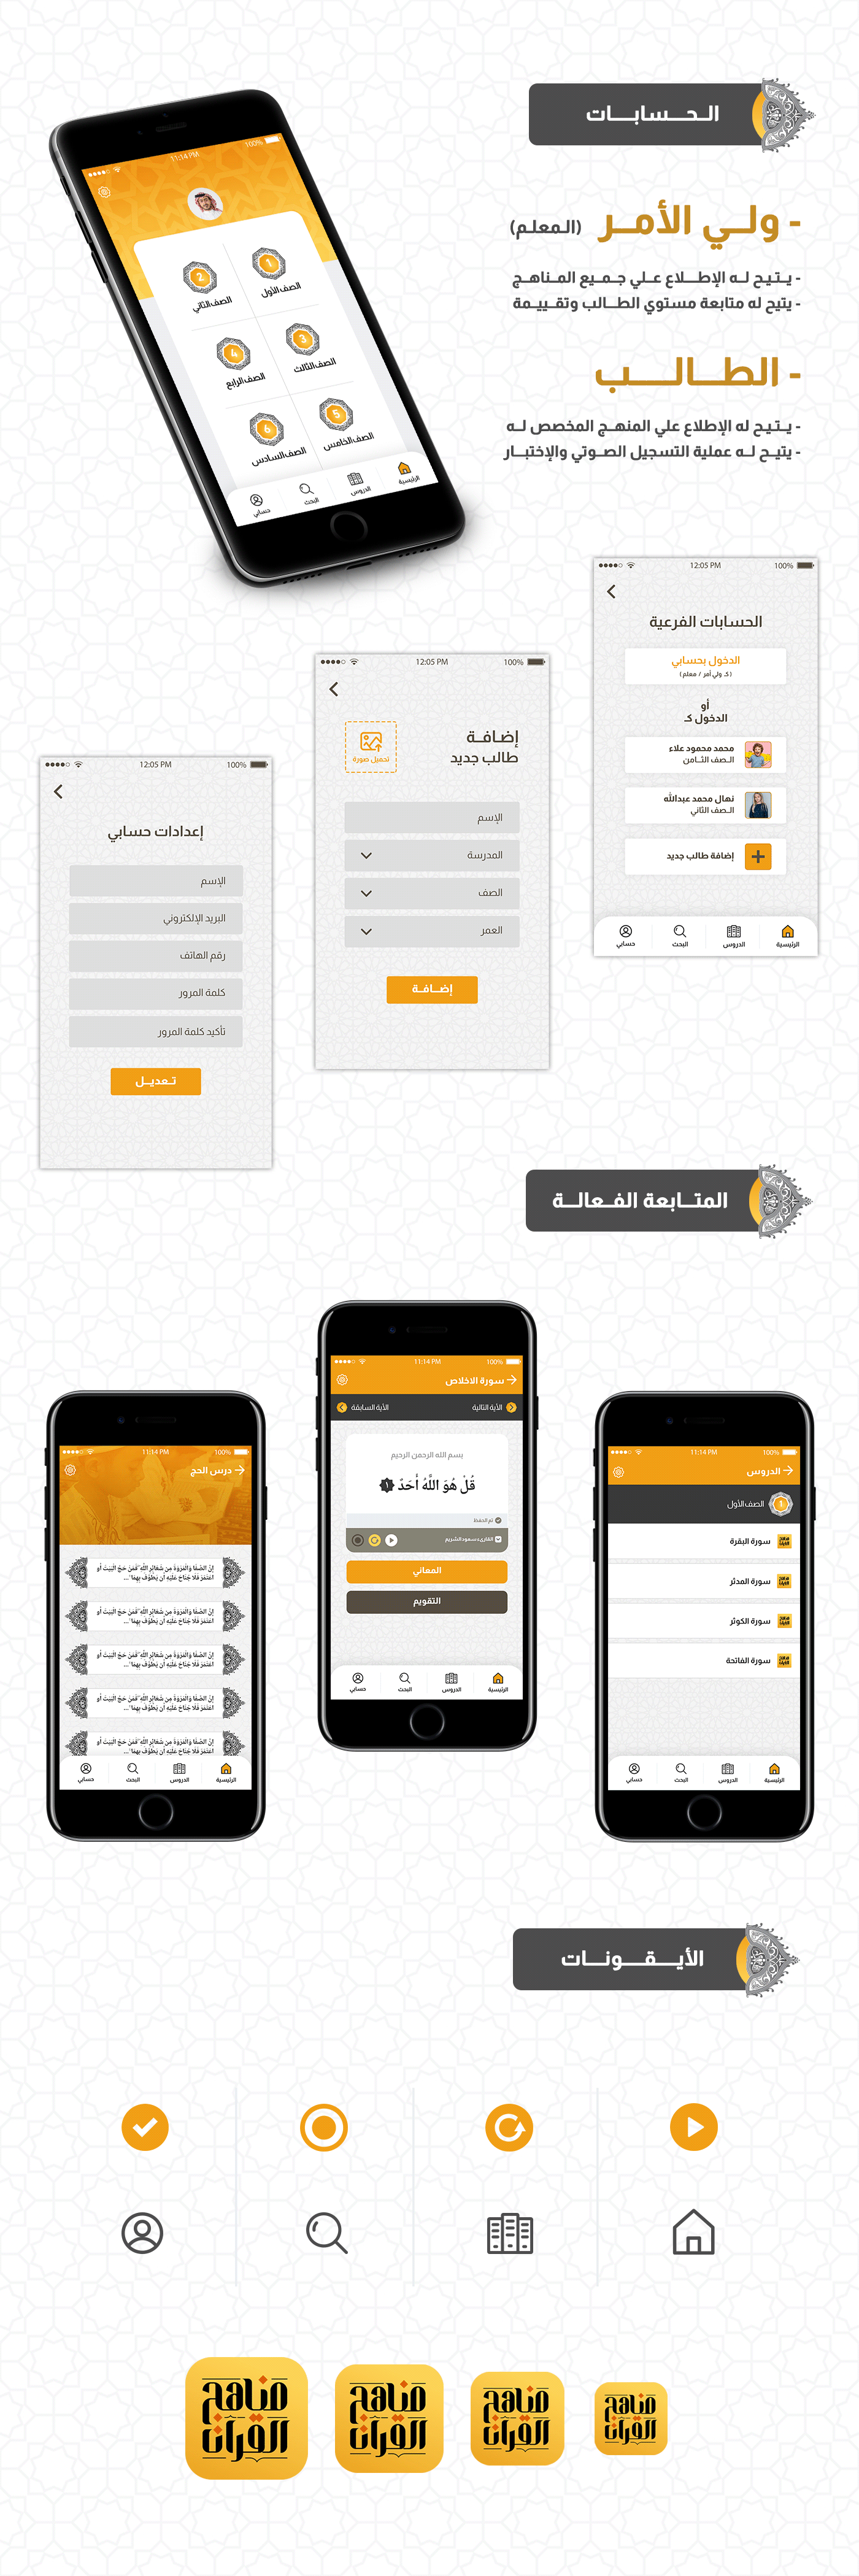 #apps #Branding #graphicDesign #hybrid #mobile   #mobileapp #mobileApplication #quran #UI #UX